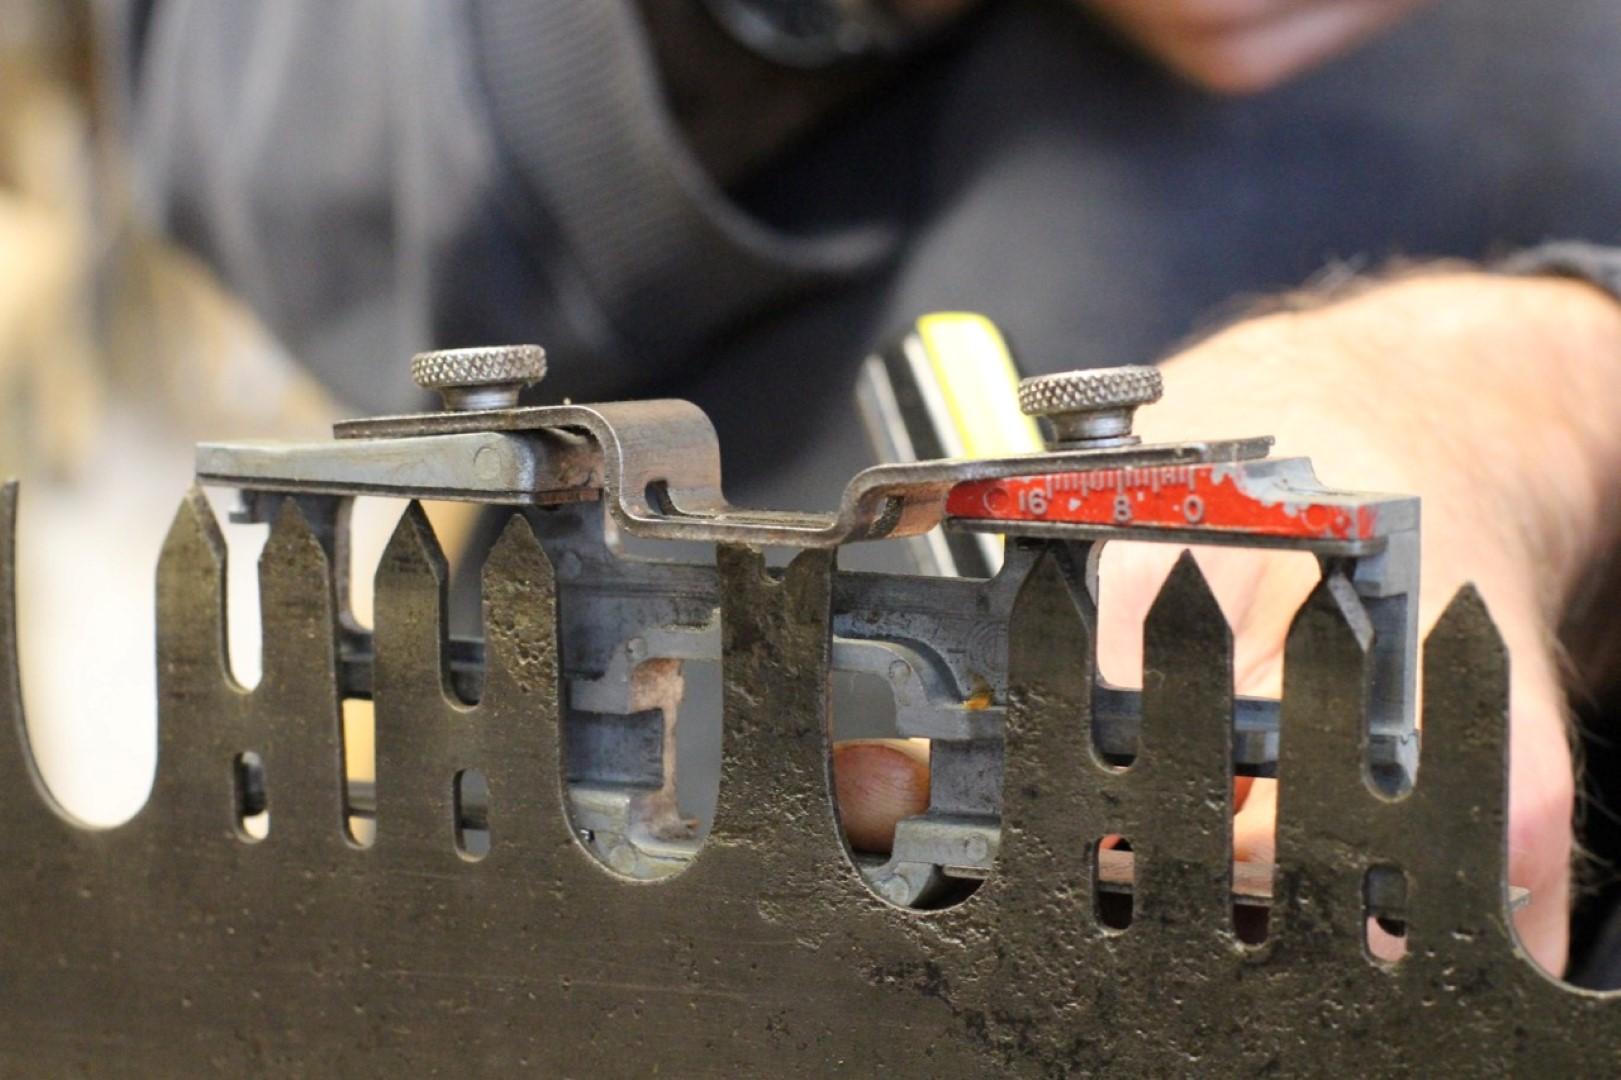 raker gauge at work